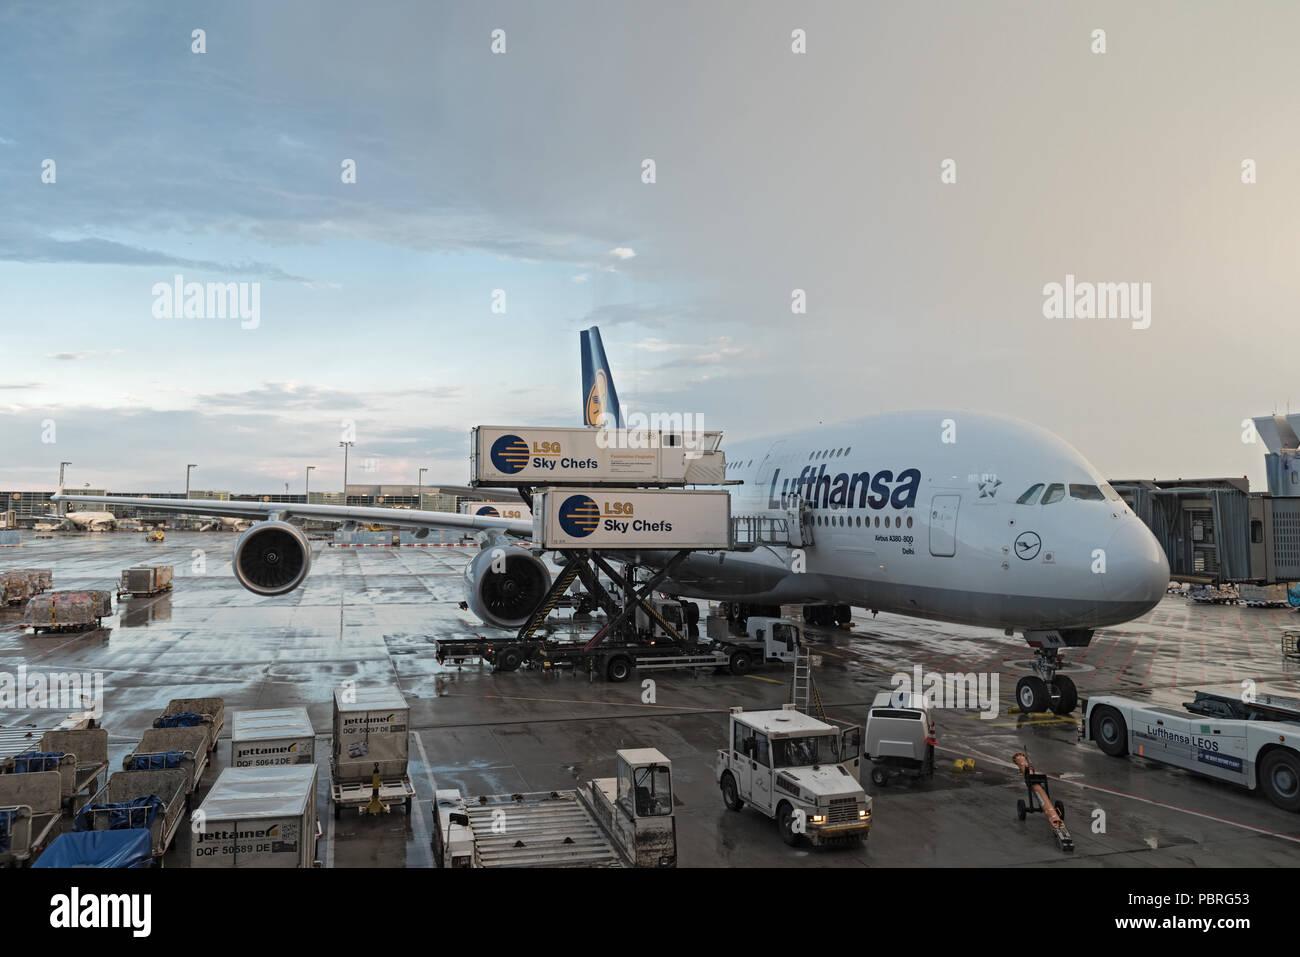 Lufthansa airbus A380 loading at Frankfurt airport. - Stock Image